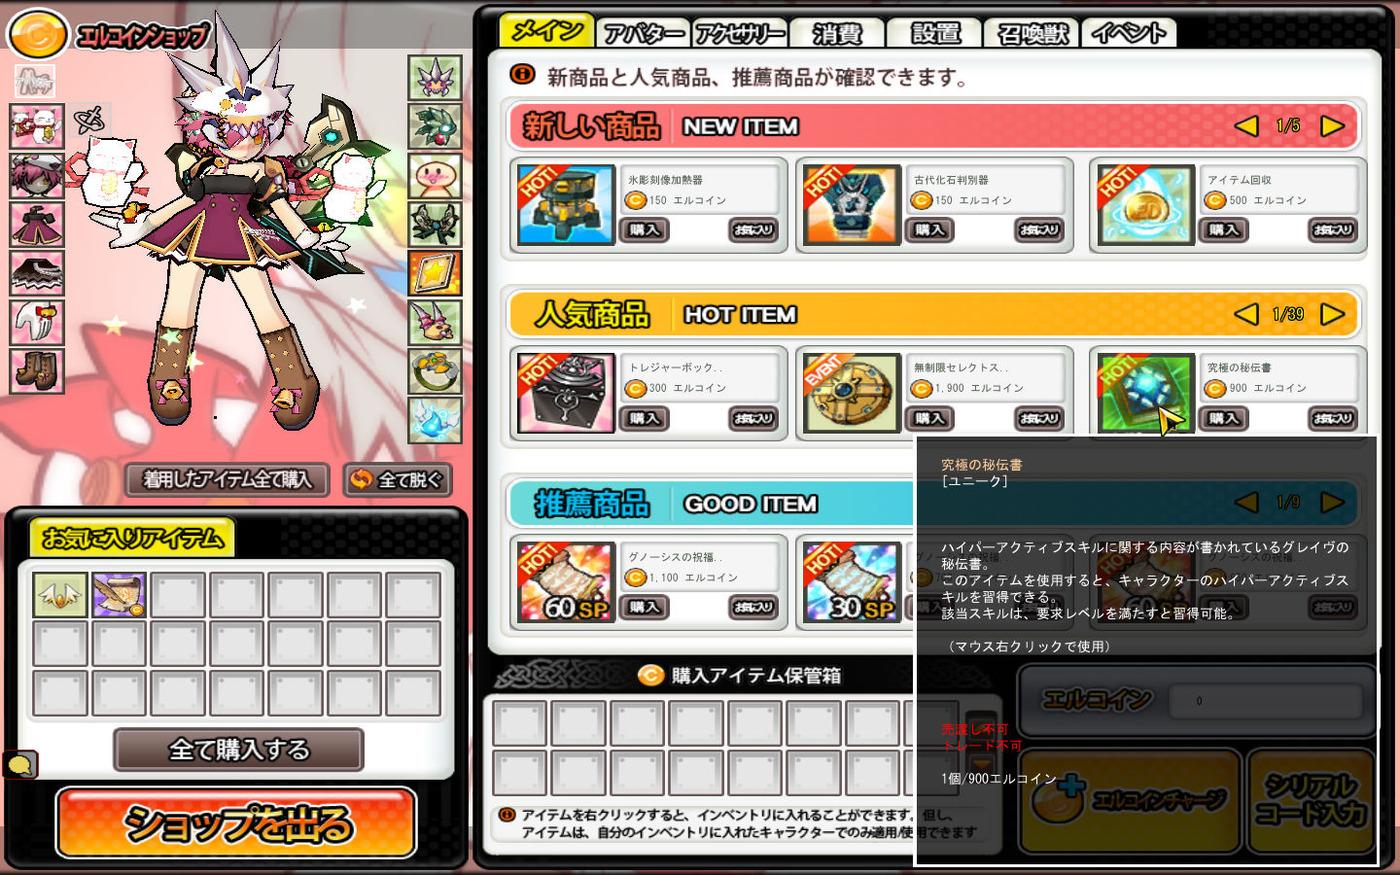 SC_ 2014-01-15 22-08-05-624